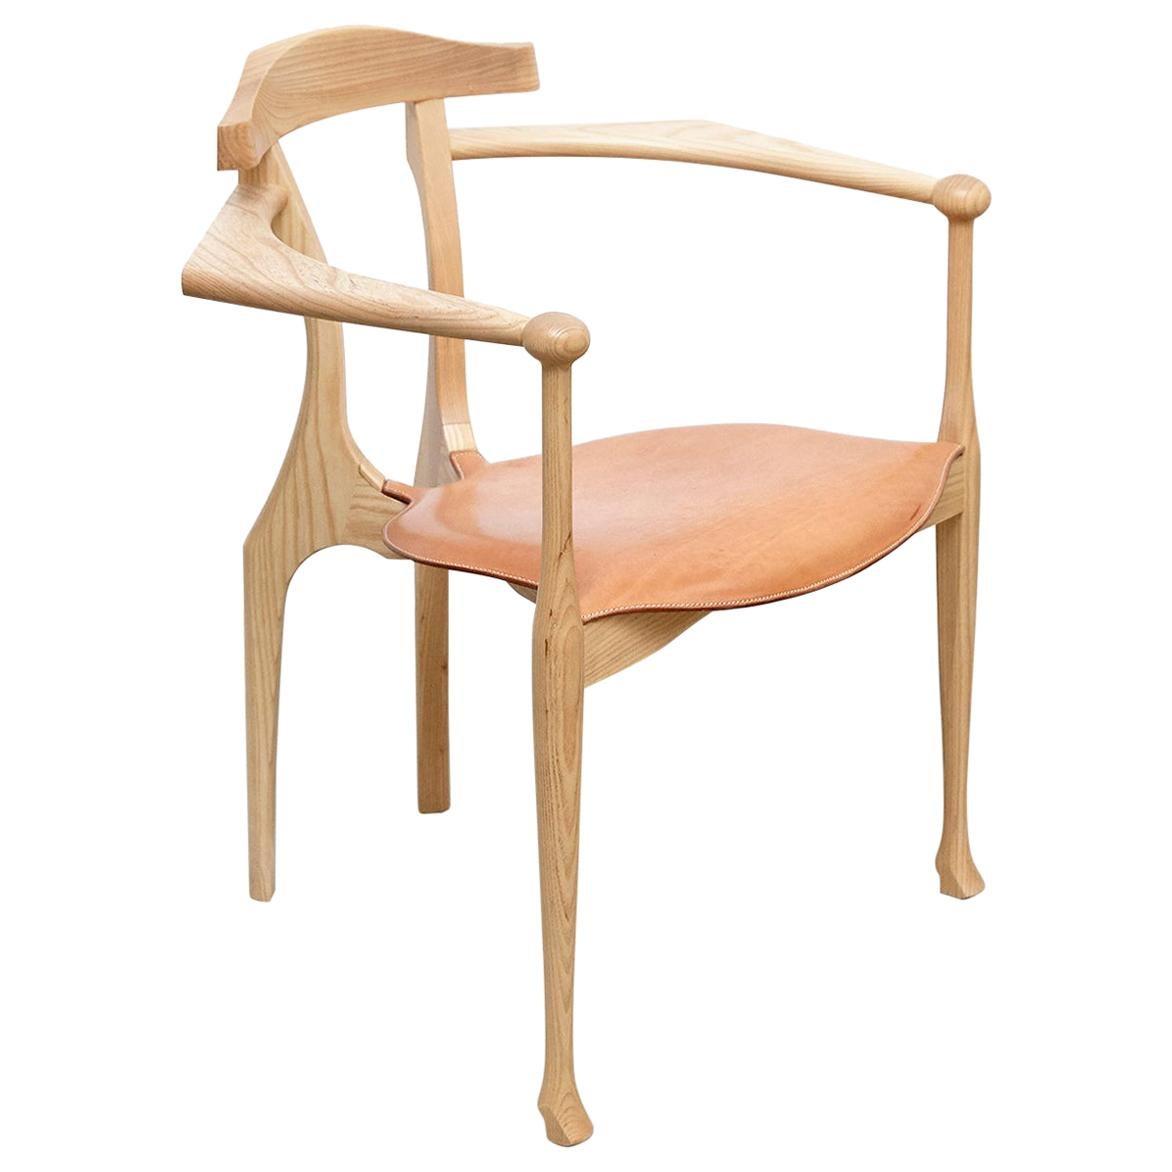 Oscar Tusquets Gaulino Armchair Prototype